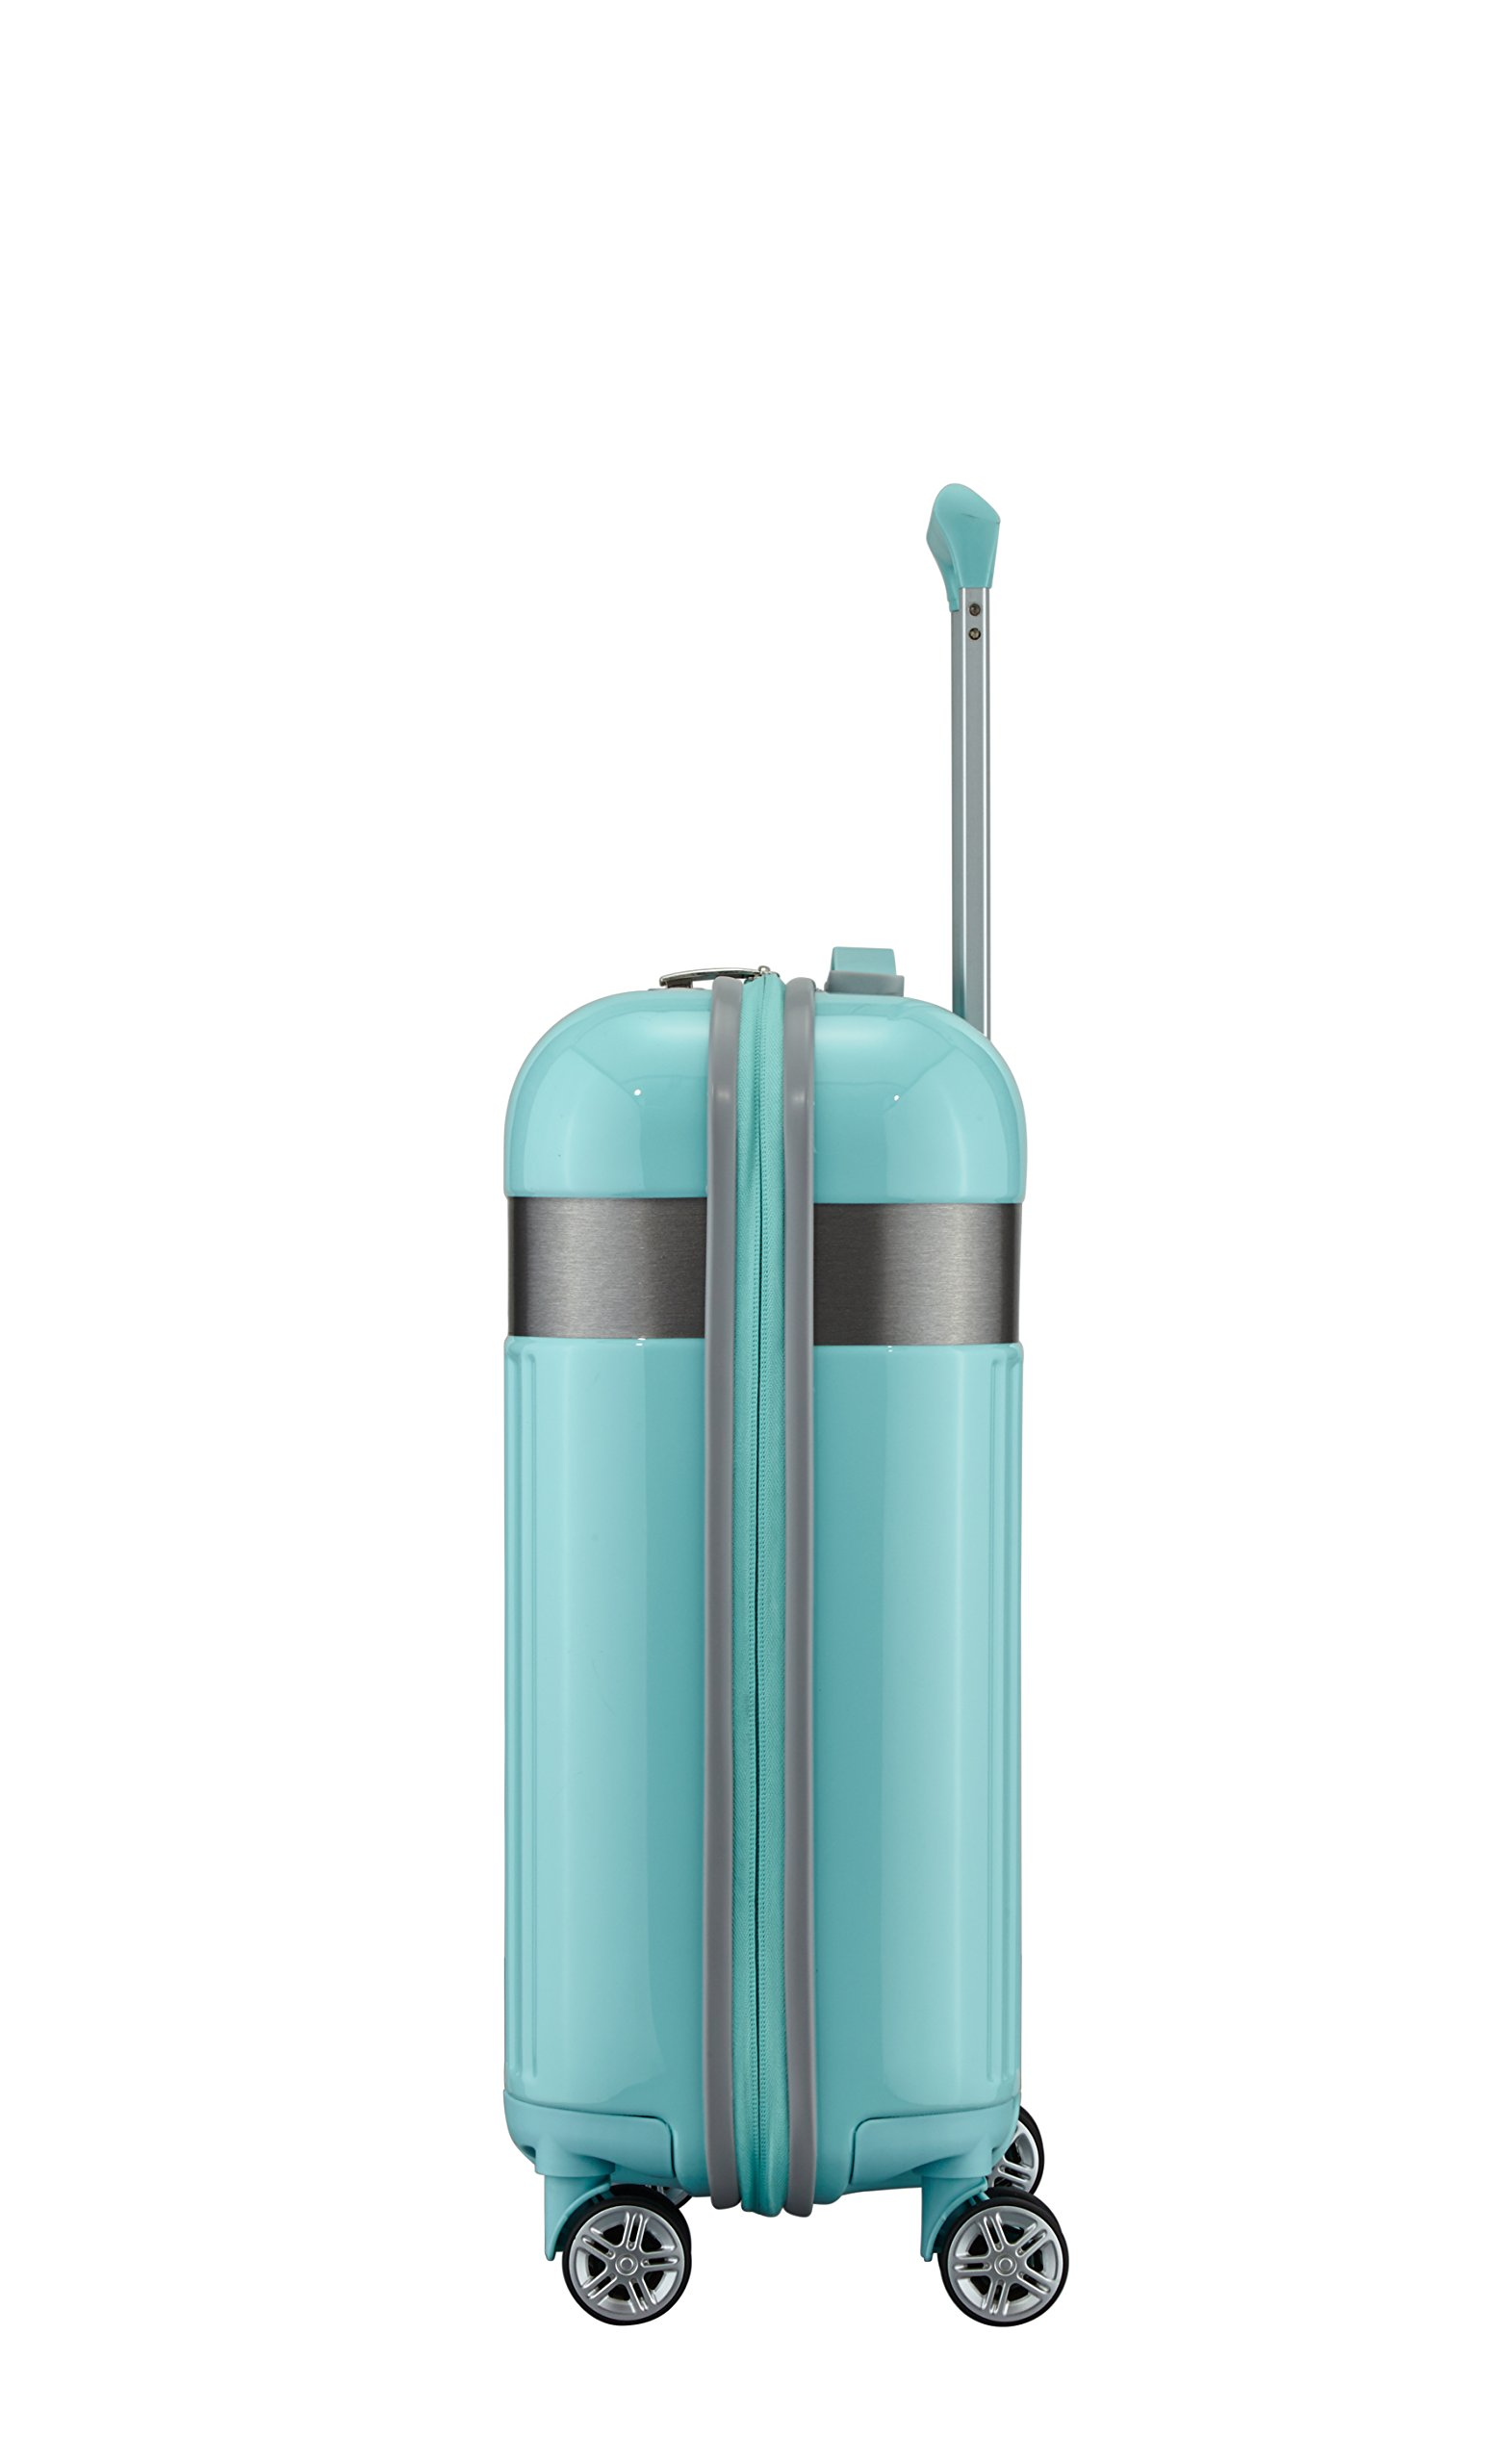 Gepckserie-Spotlight-Flash-Edle-TITAN-Trolleys-und-Beautycases-in-knallbunten-Trendfarben